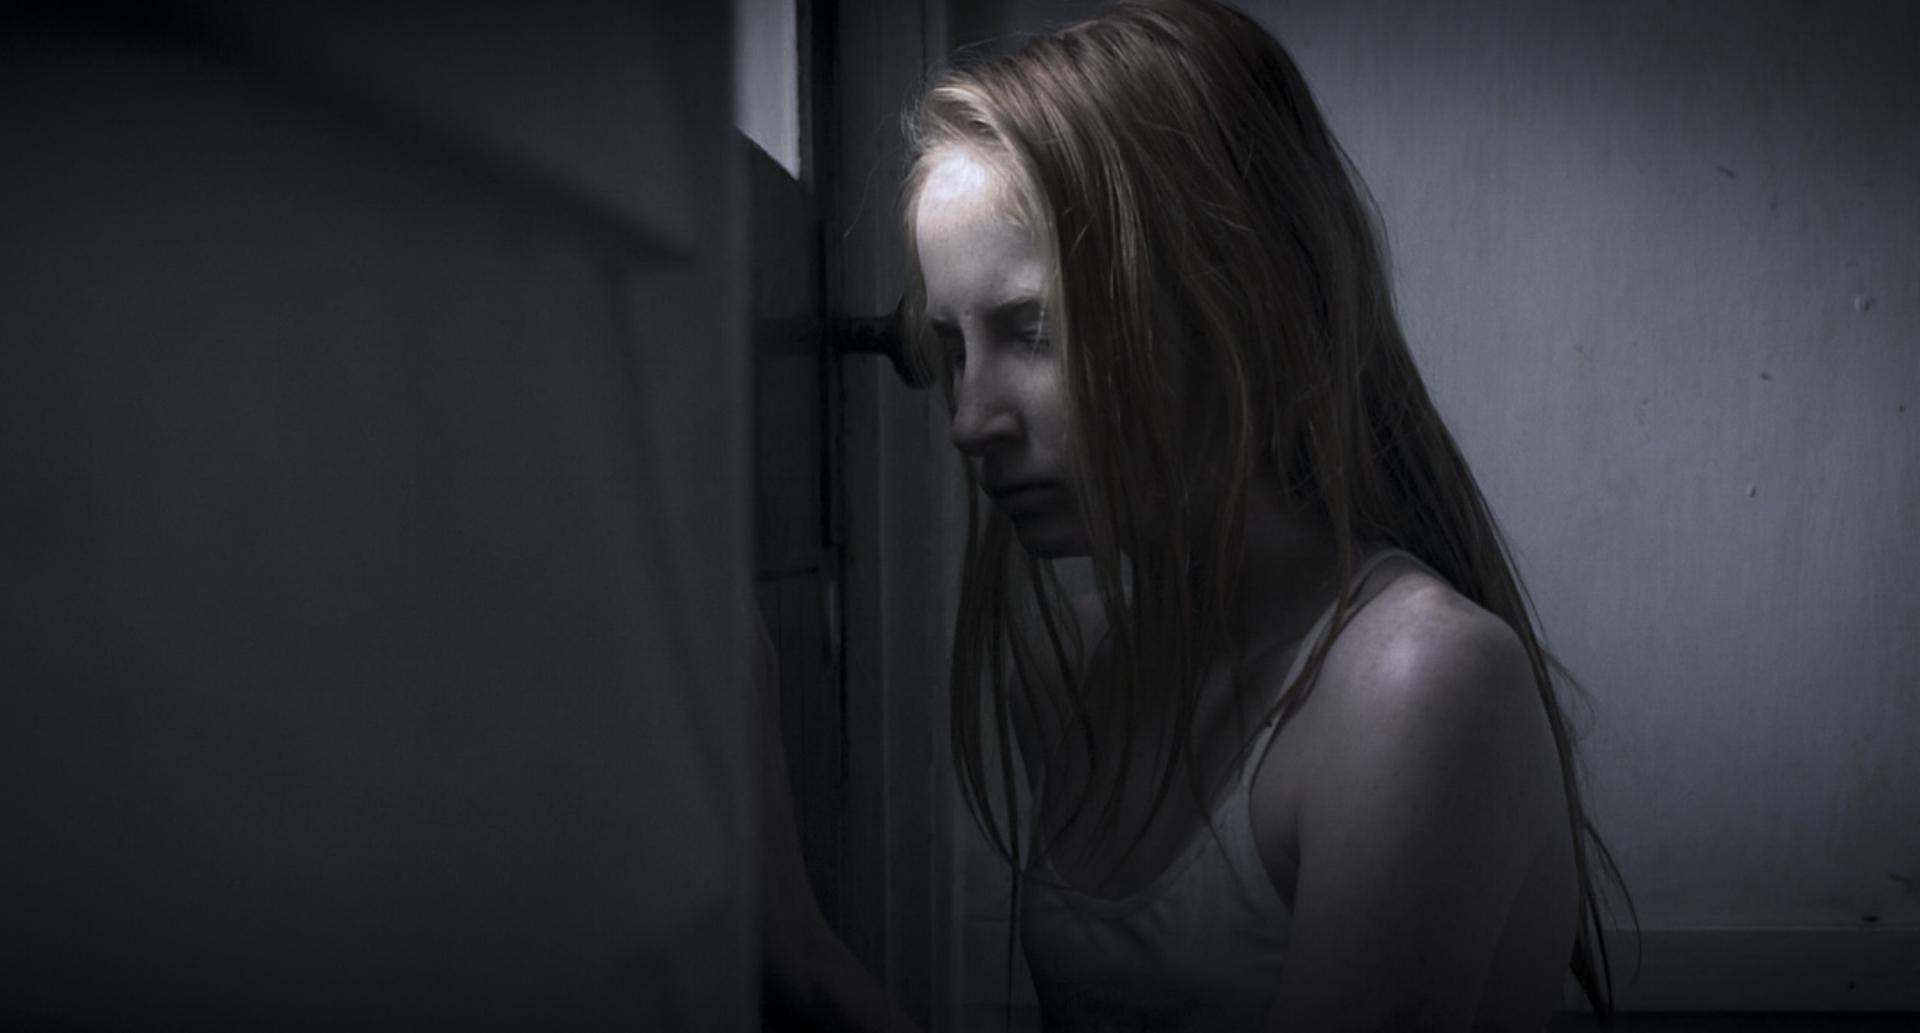 princess | 2012 - Short FilmDirected by Miki ClarkeWritten & Produced by Lauren Brown